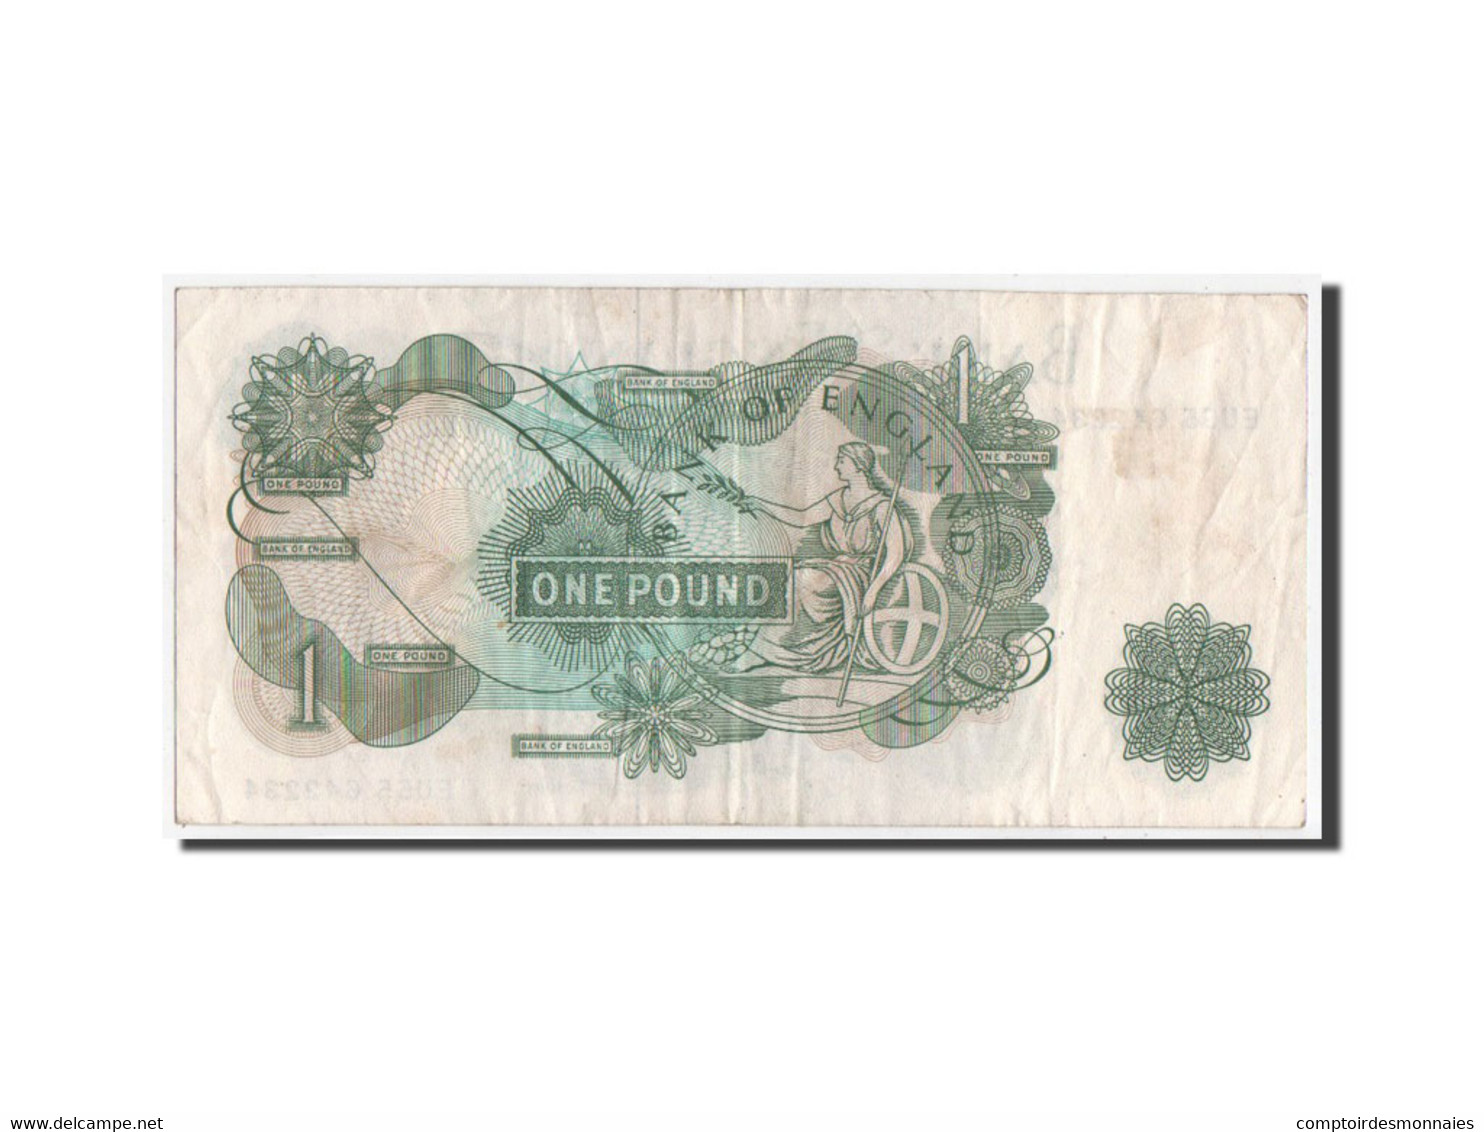 [#350555] Grande Bretagne, 1 Pound Type 1957-61 ND, Pick 374g - 1 Pound